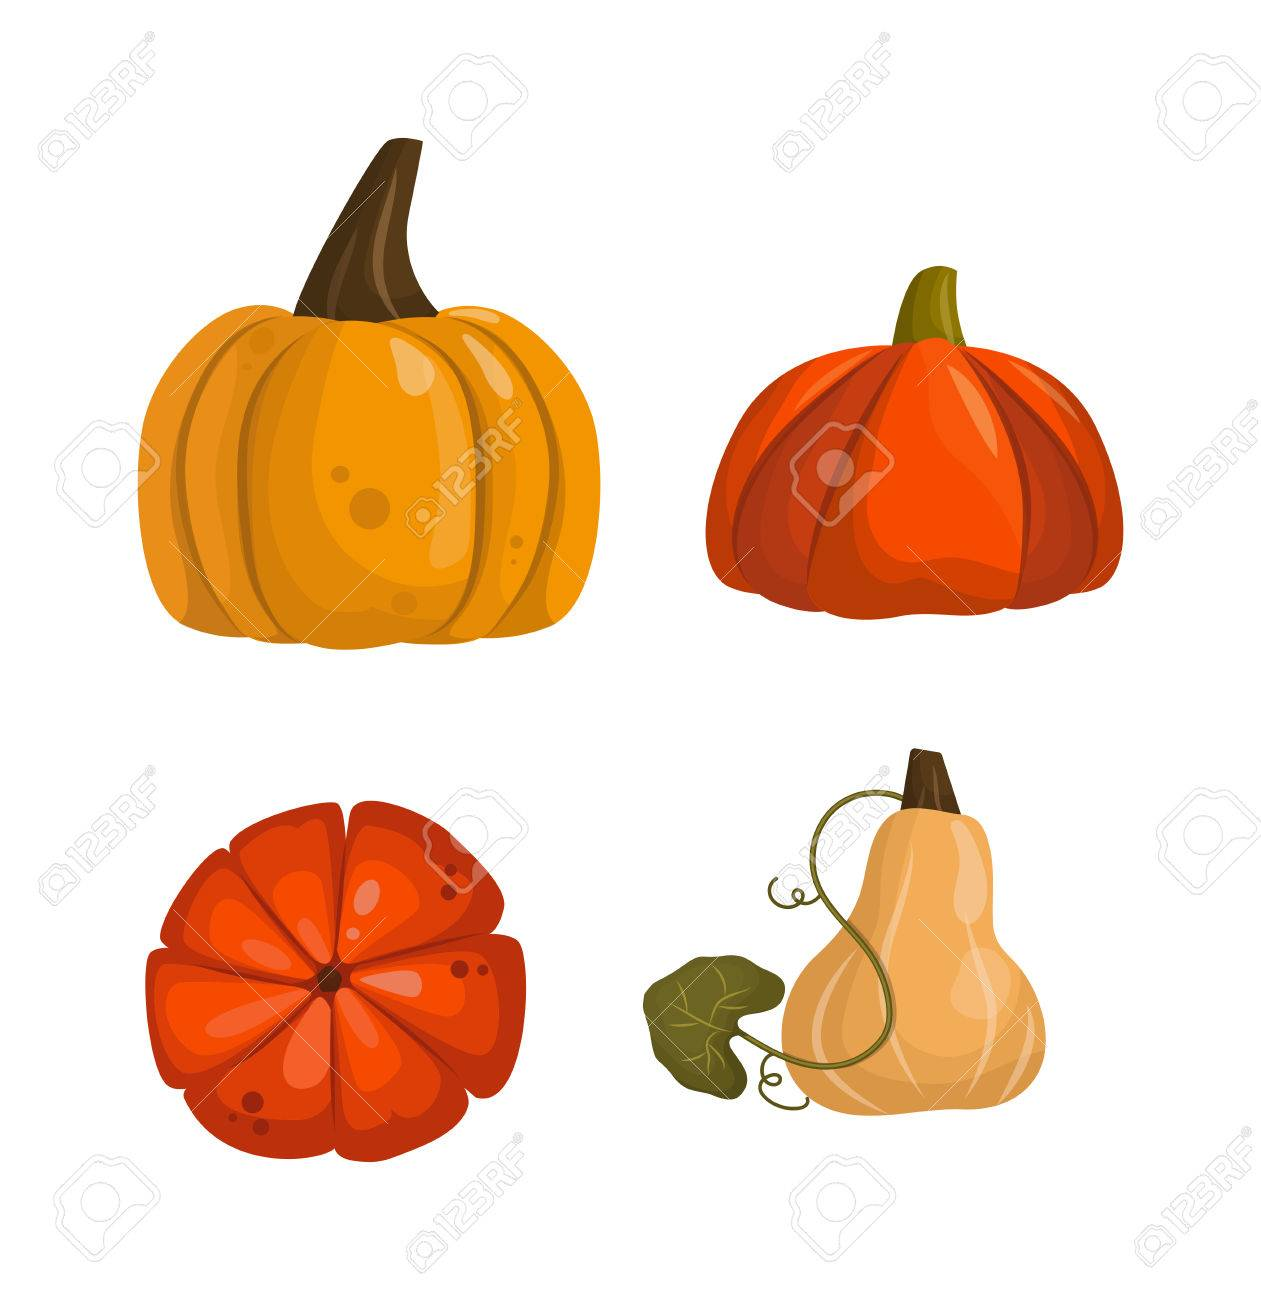 Nett Süße Halloween Kürbis Malvorlagen Fotos - Entry Level Resume ...